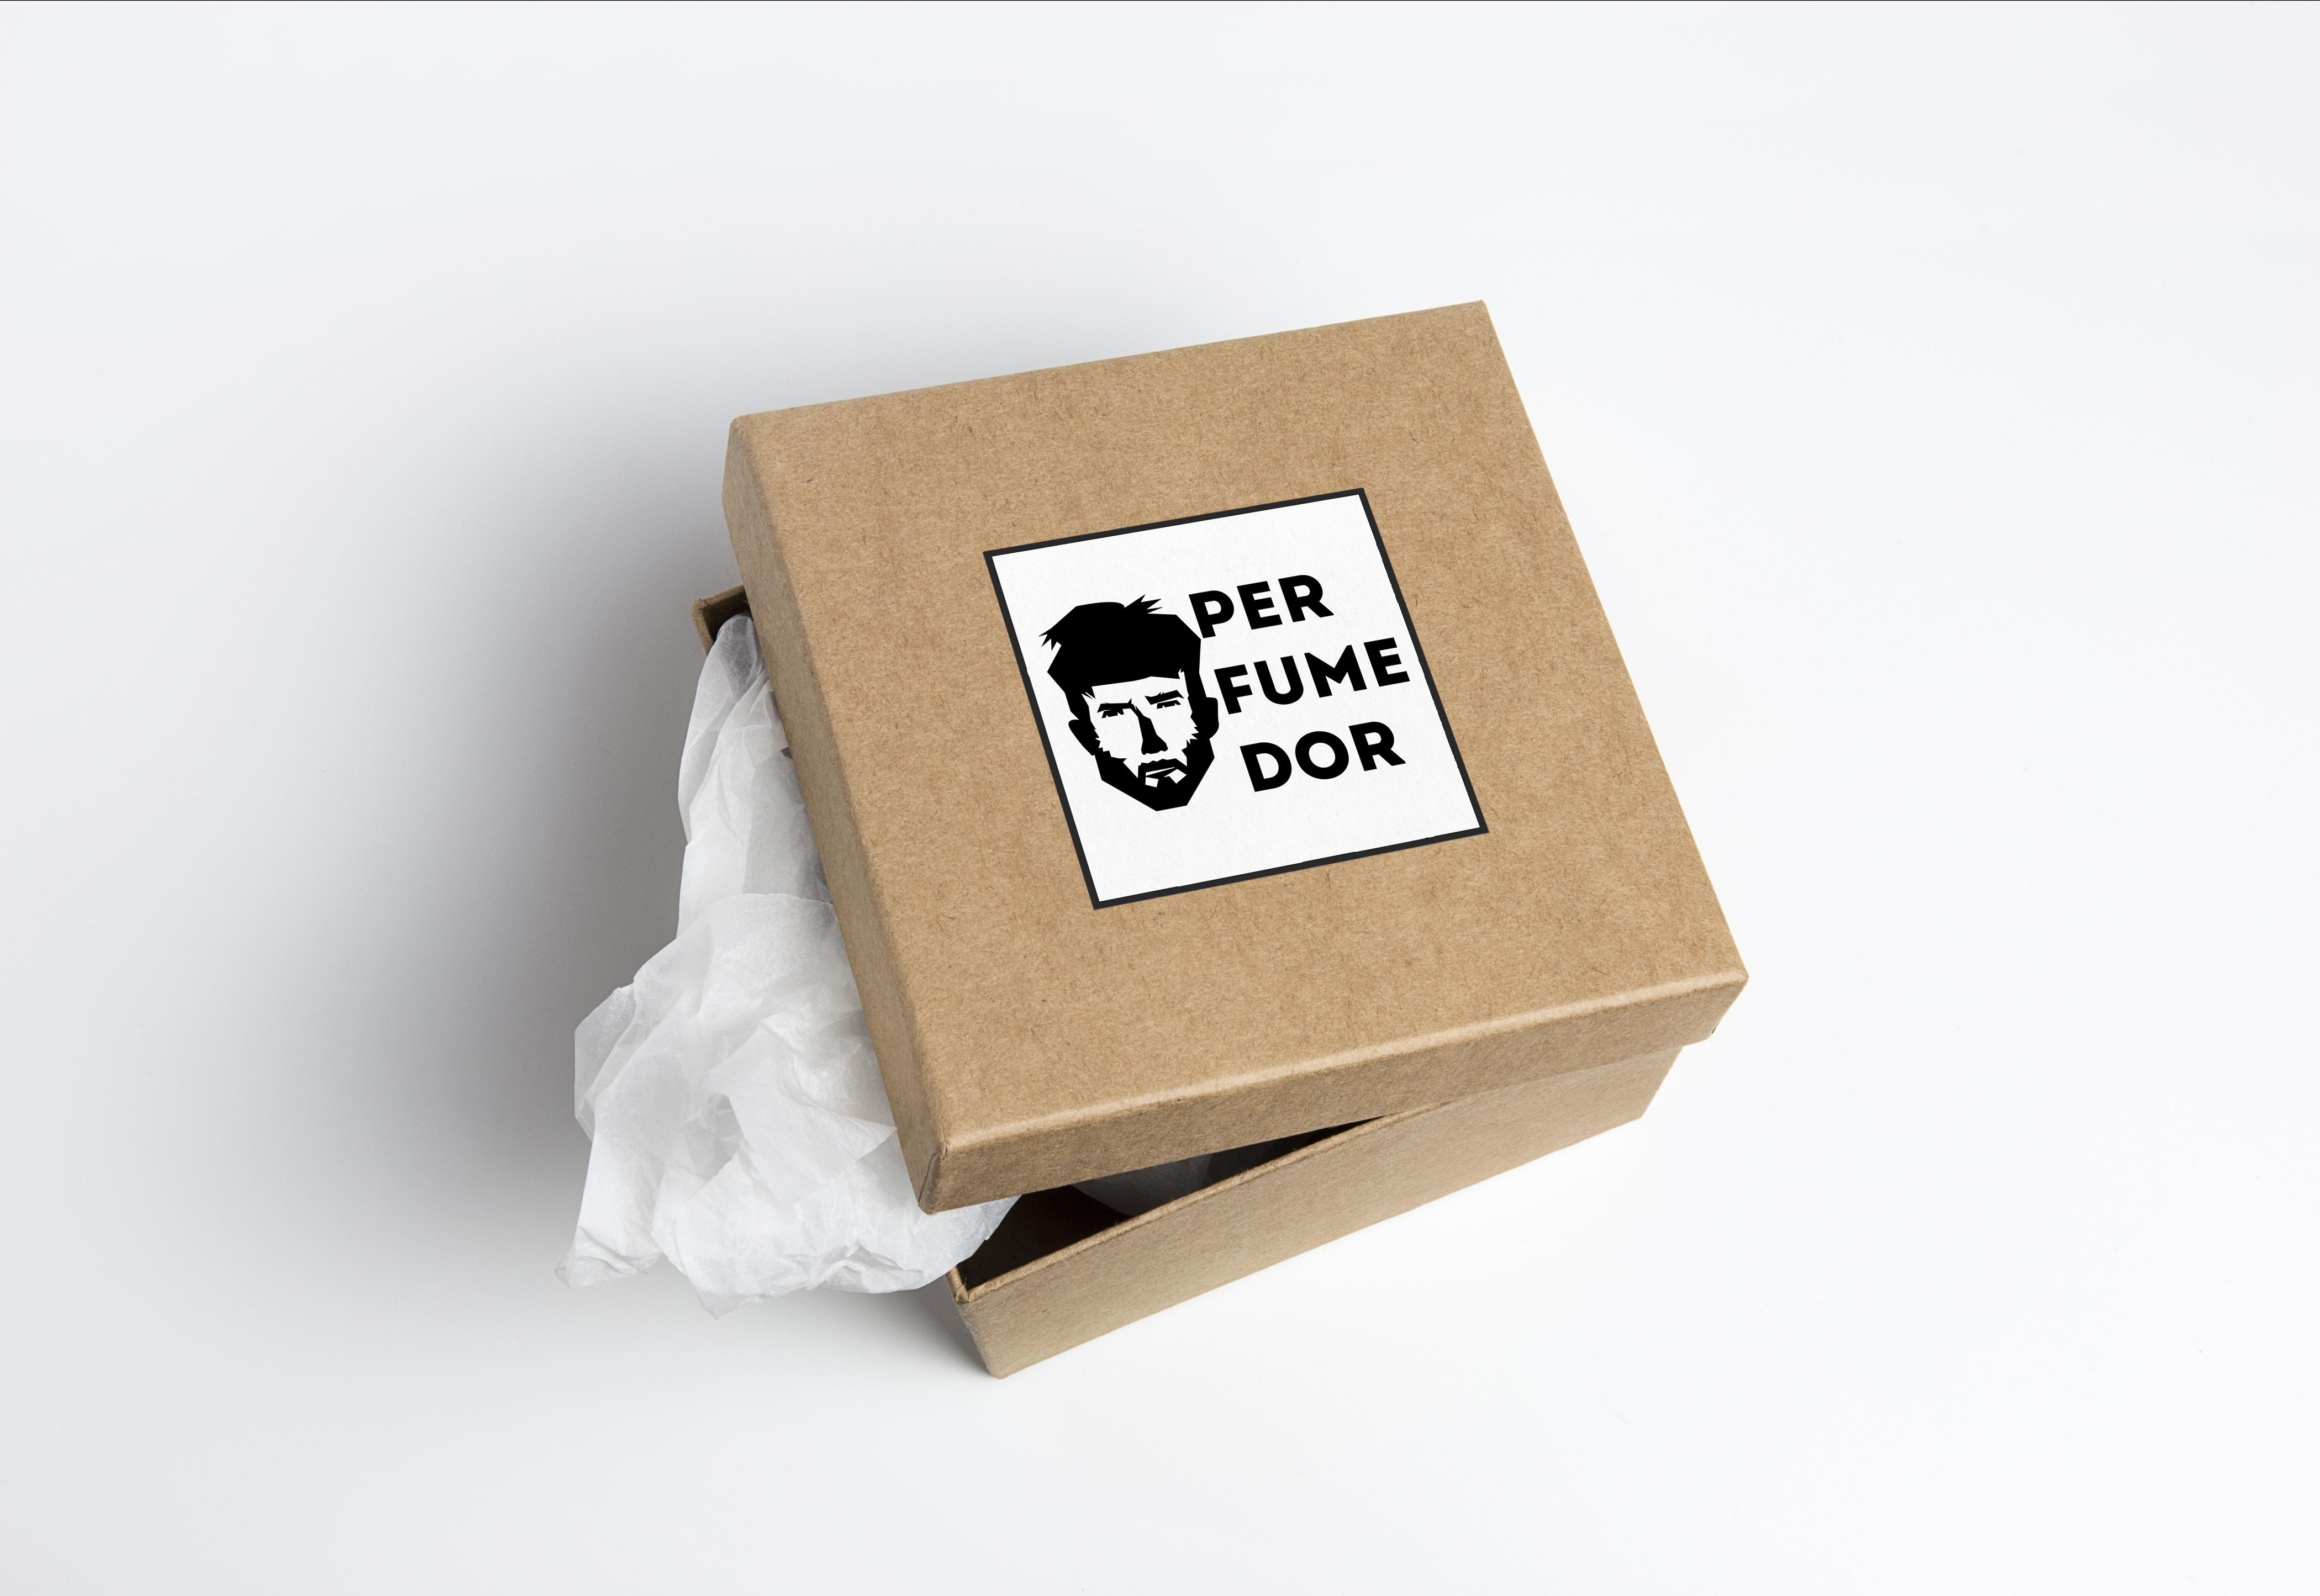 Логотип для интернет-магазина парфюмерии фото f_8835b480363a0fdd.jpg